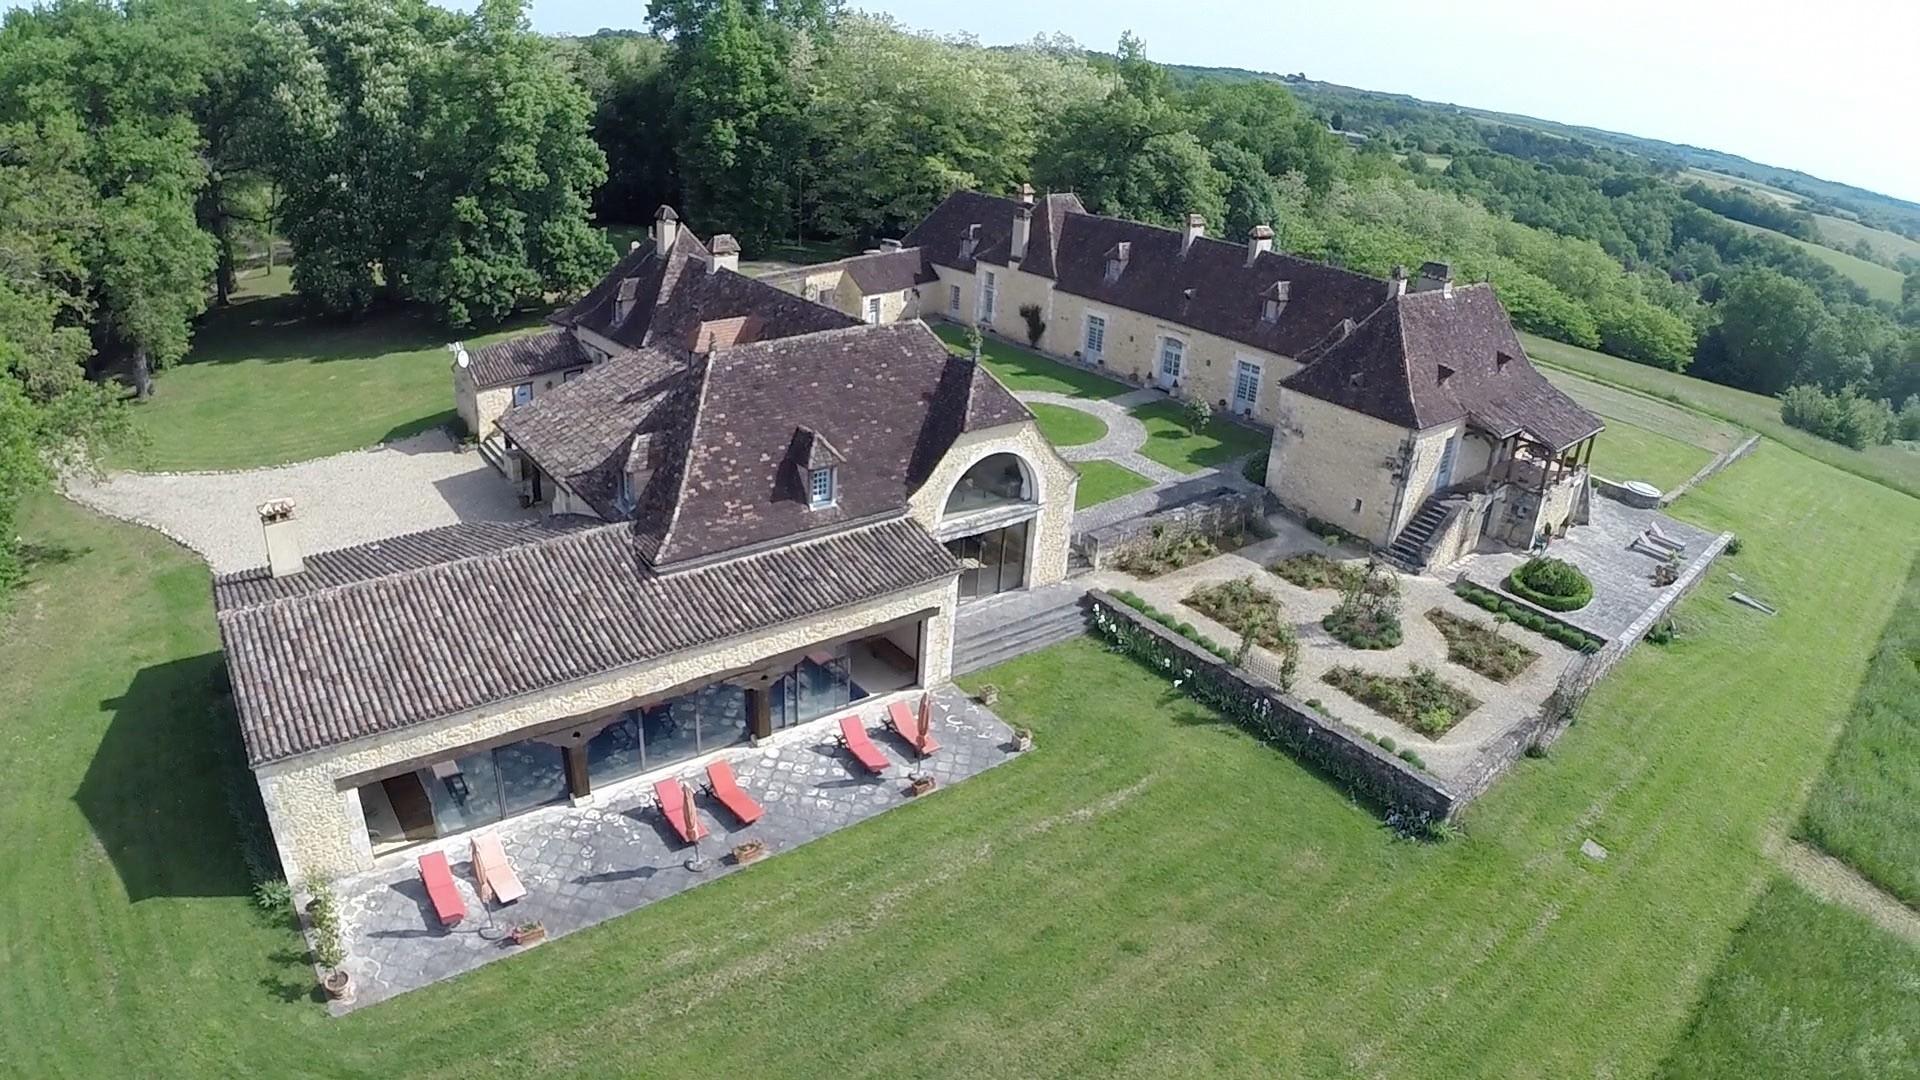 Equestrian Property in the Dordogne